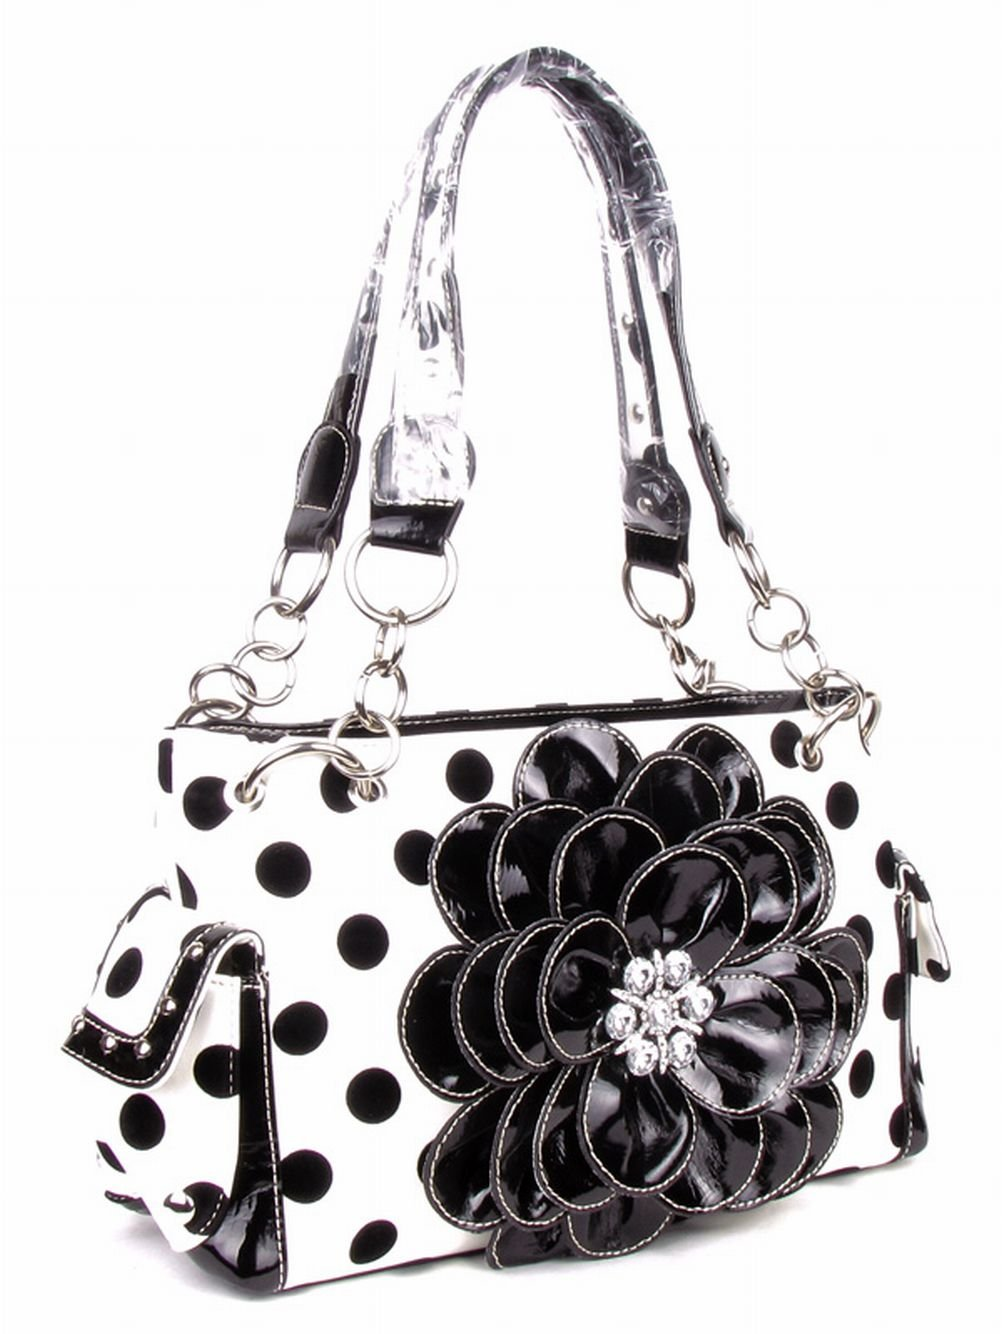 GoCowgirl Polka Dots Rhinestone 3D Flower Handbag Purse with Matching Wallet Free Bracelet